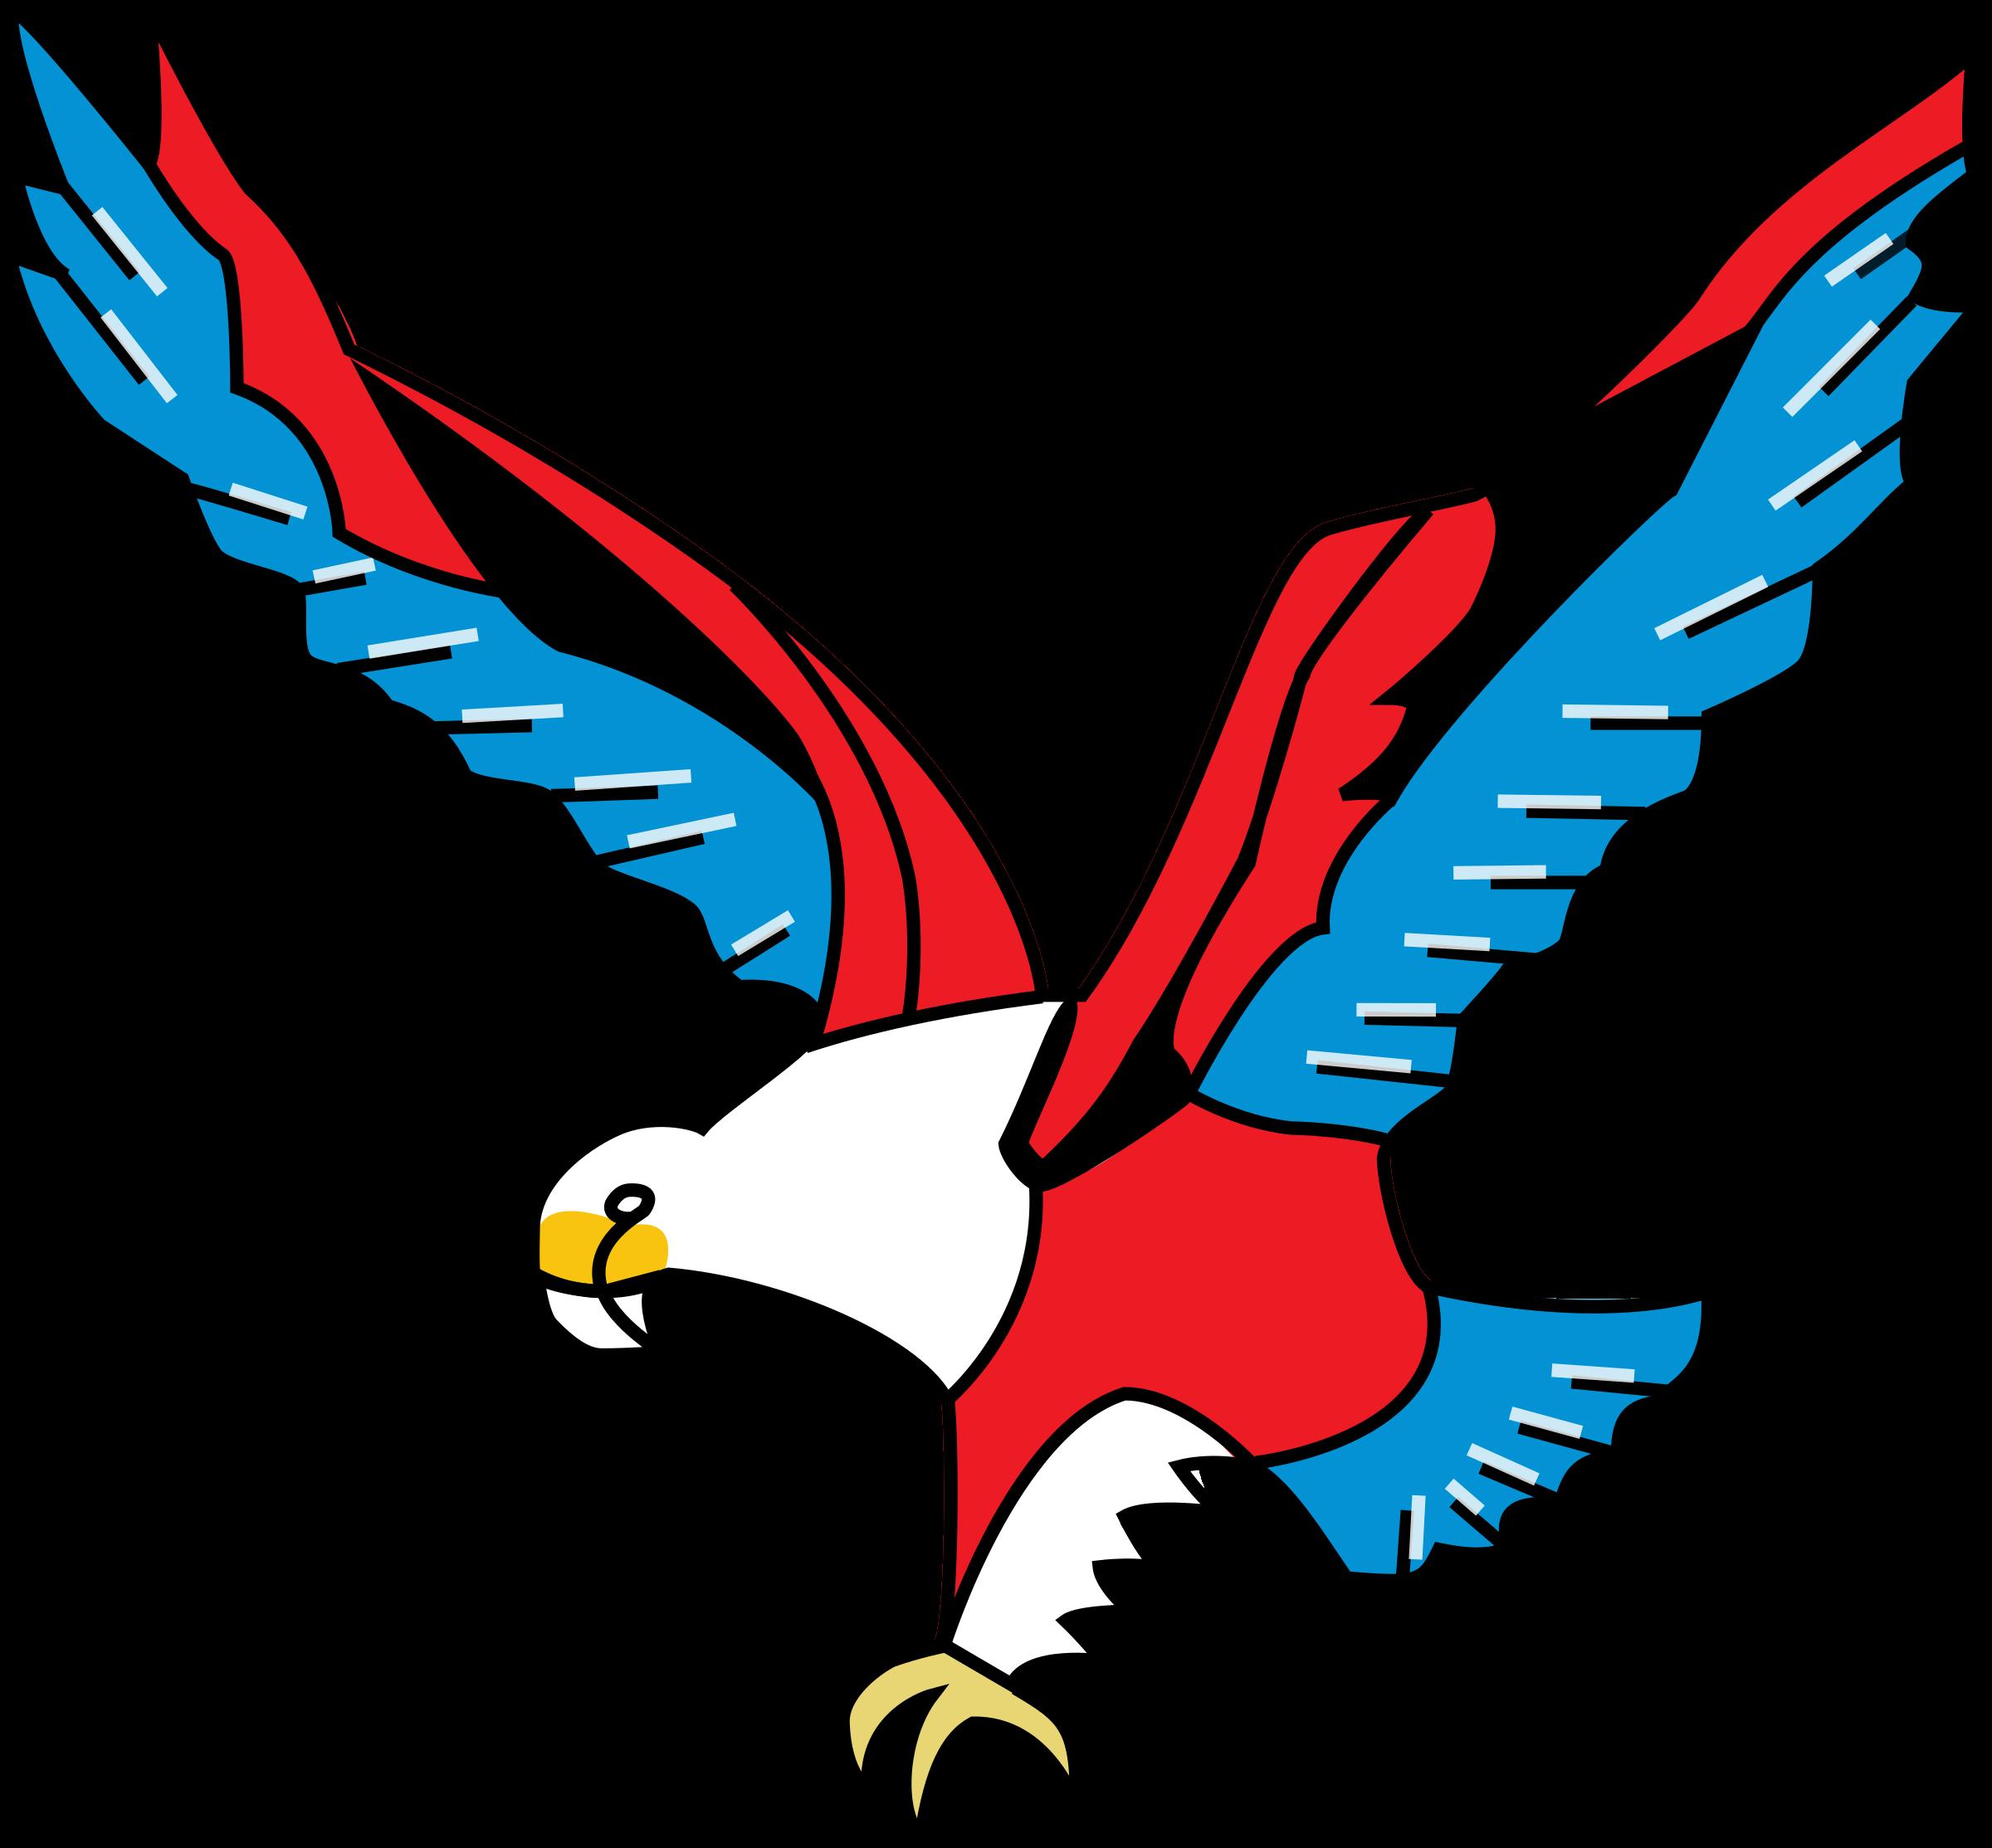 Eagle big image png. Clipart bird fish